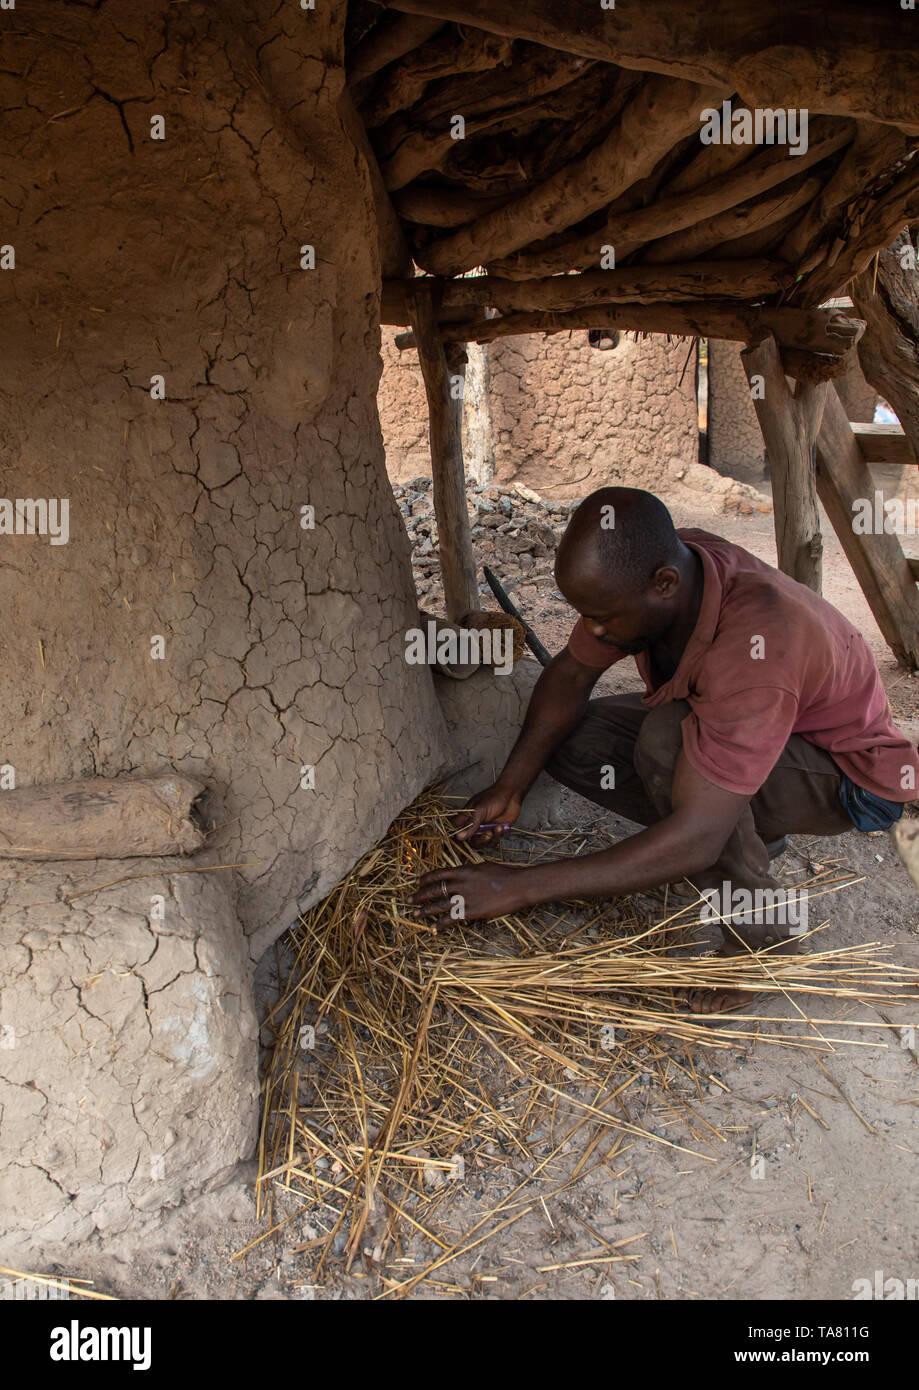 Senufo blacksmith preparing the fire, Poro region, Koni, Ivory Coast Stock Photo